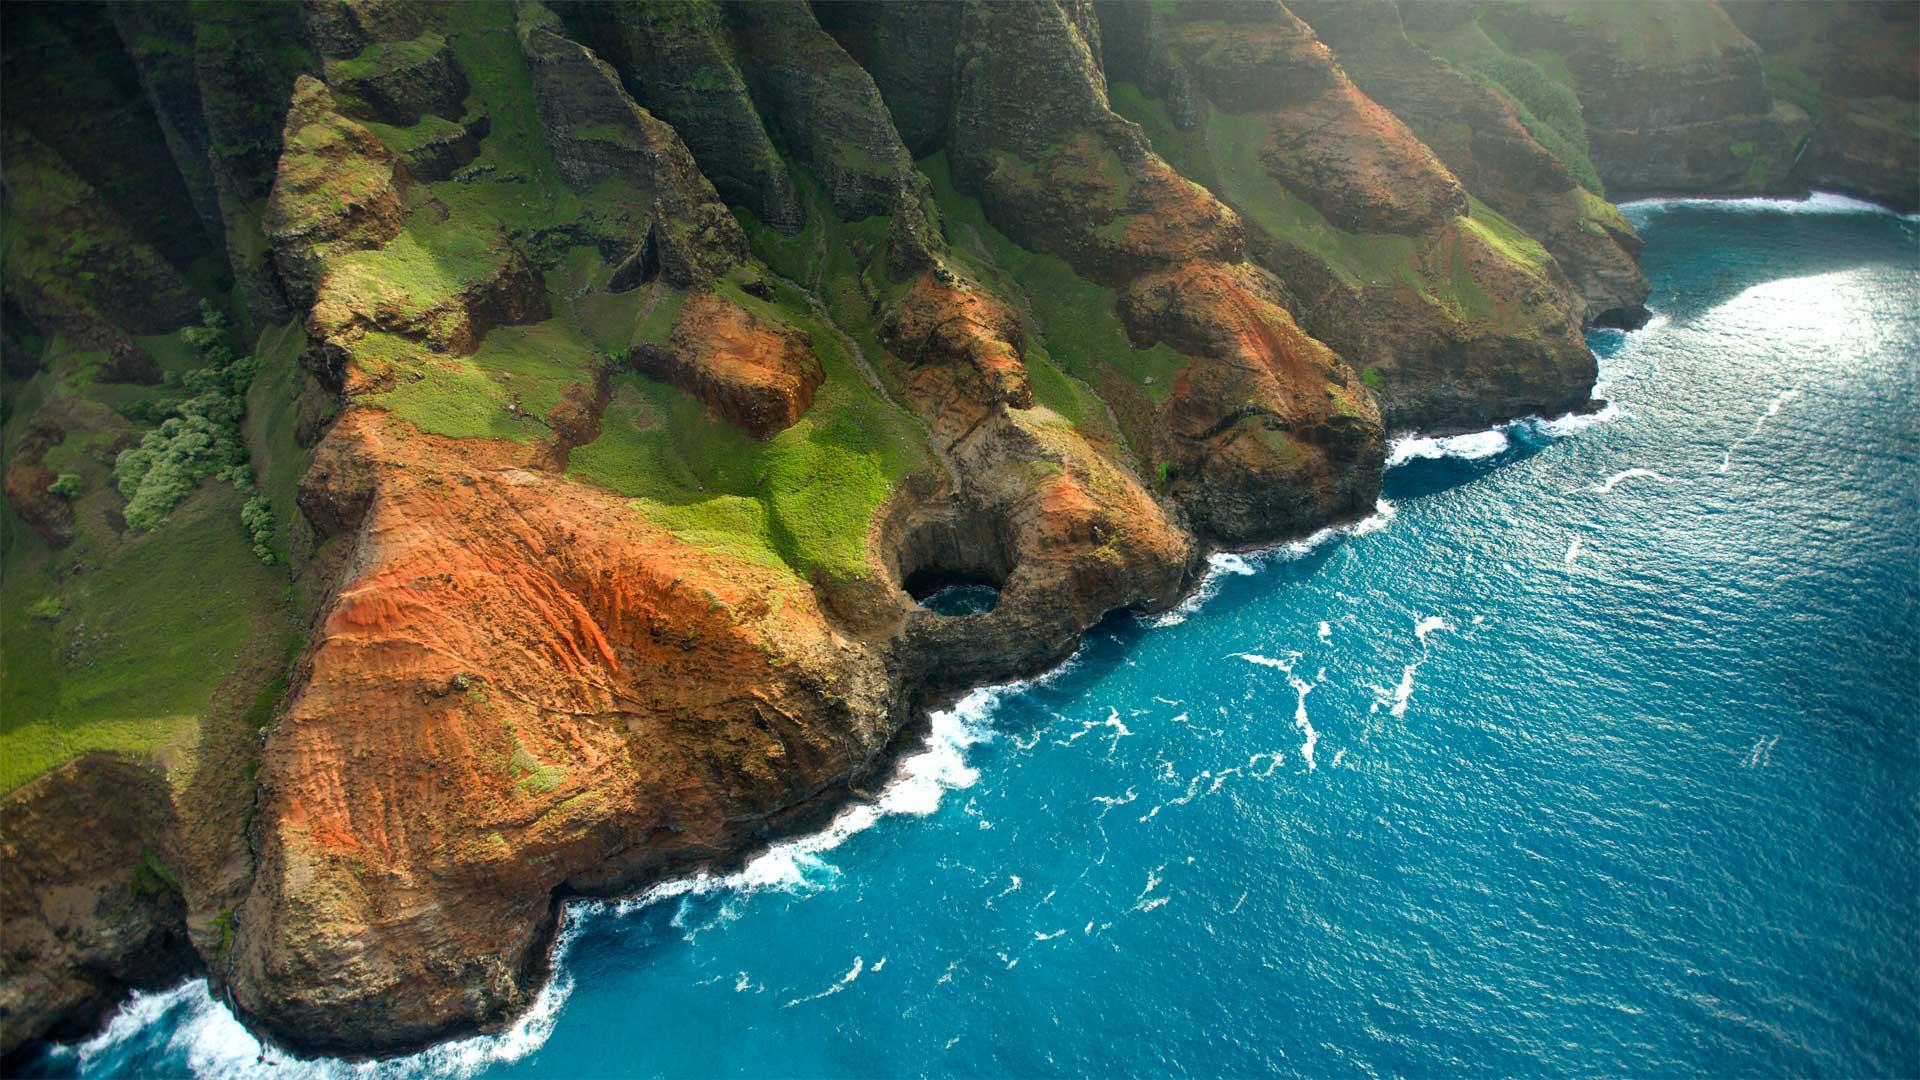 Bright Eye sea cave on the Nā Pali Coast, Kauai, Hawaii (© jimkruger/Getty Images)(Bing United States)